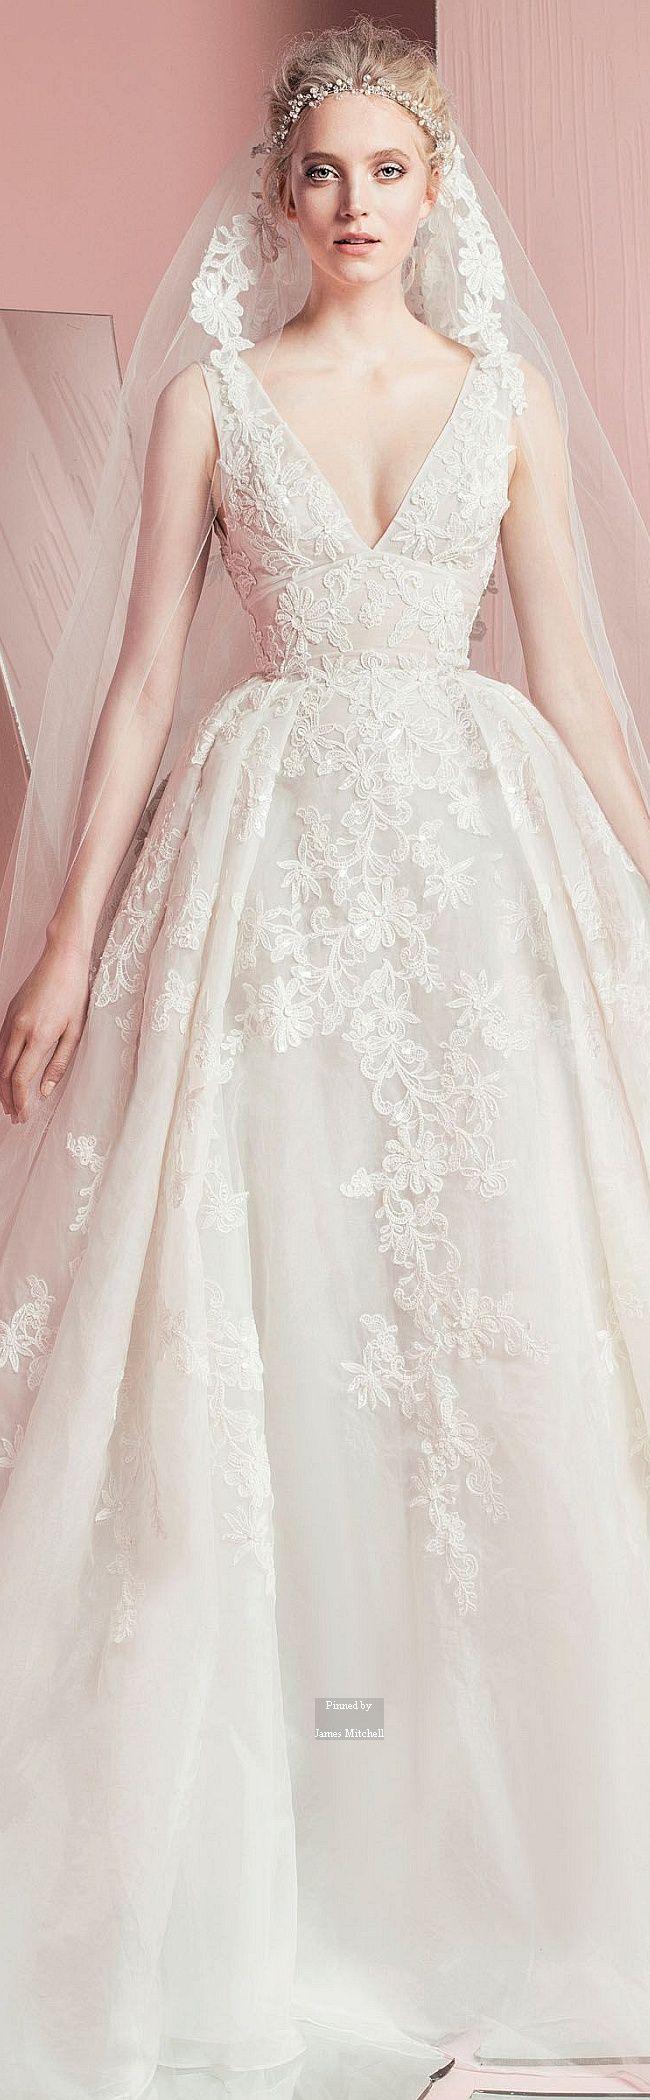 best gelinlikler images on pinterest gown wedding sweet dress